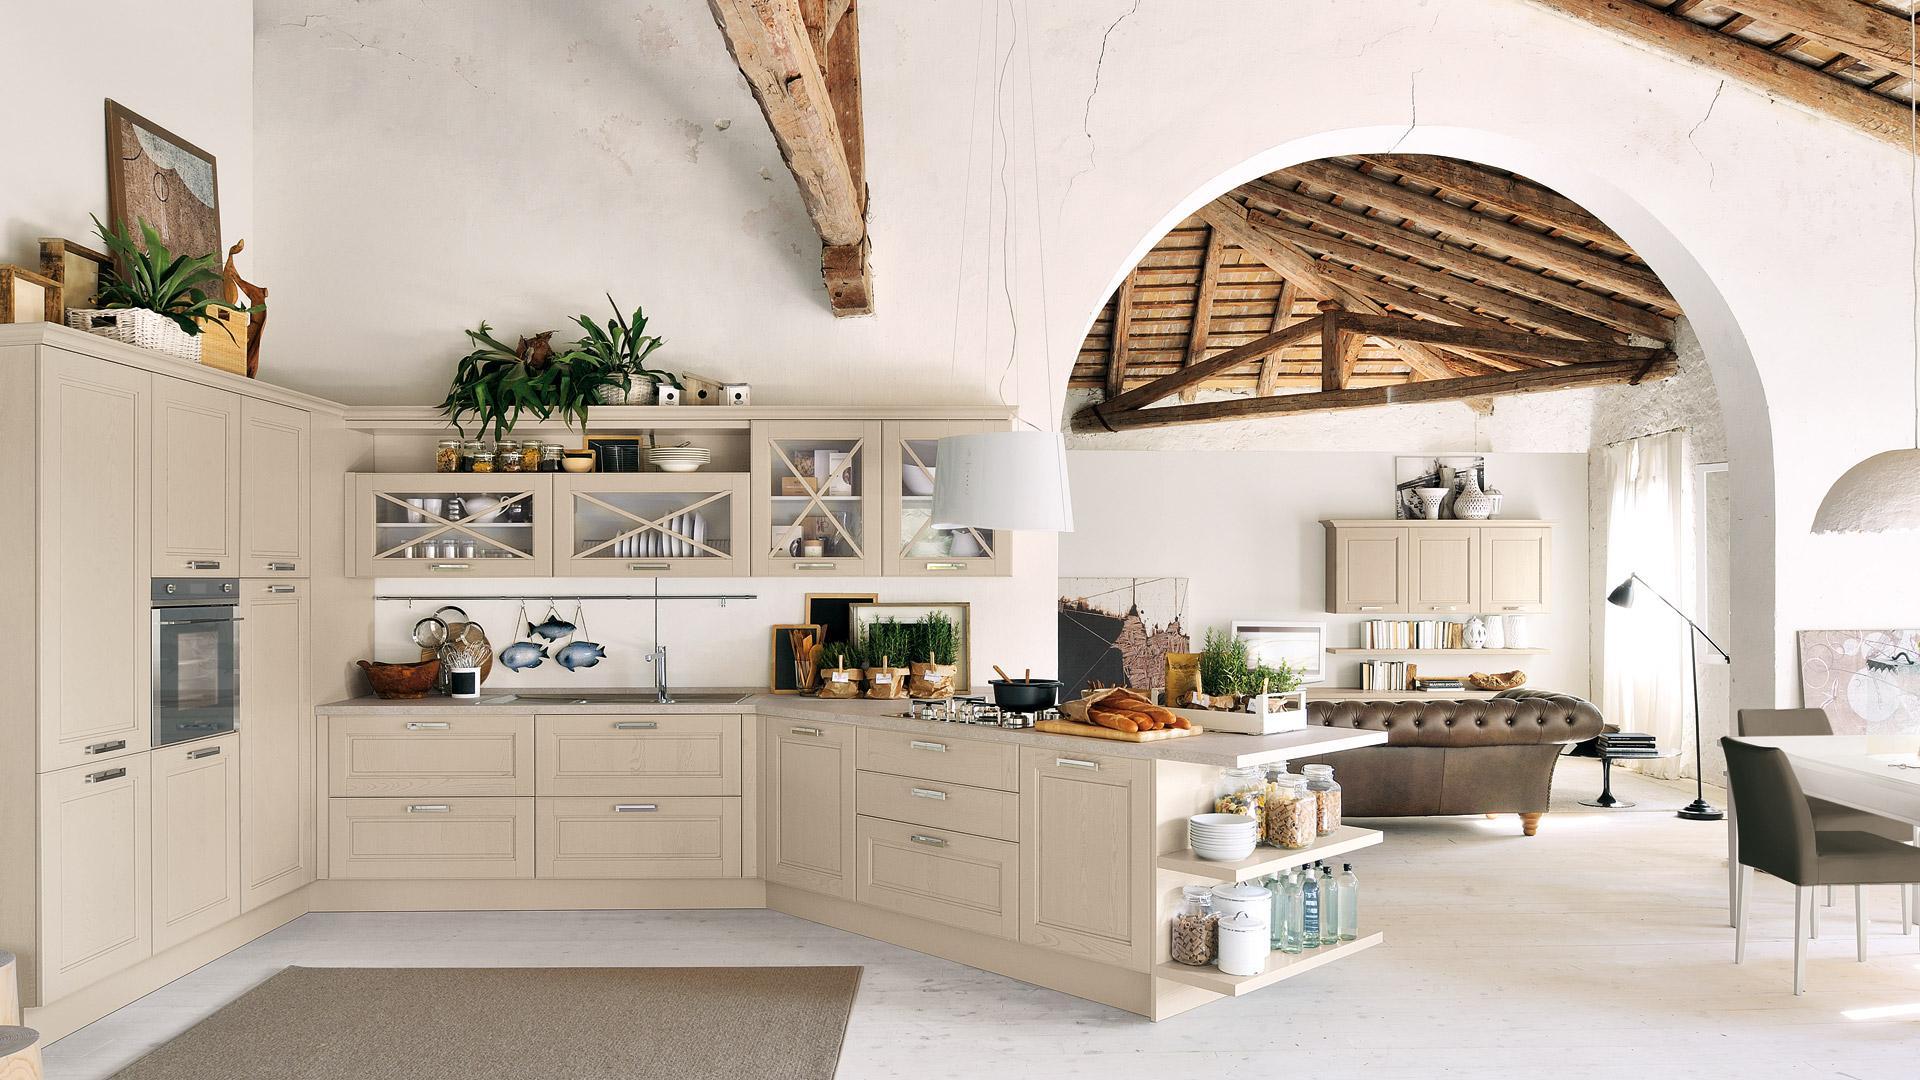 Cucina rustica le soluzioni classiche di lube store per - Arredamento cucina classica ...